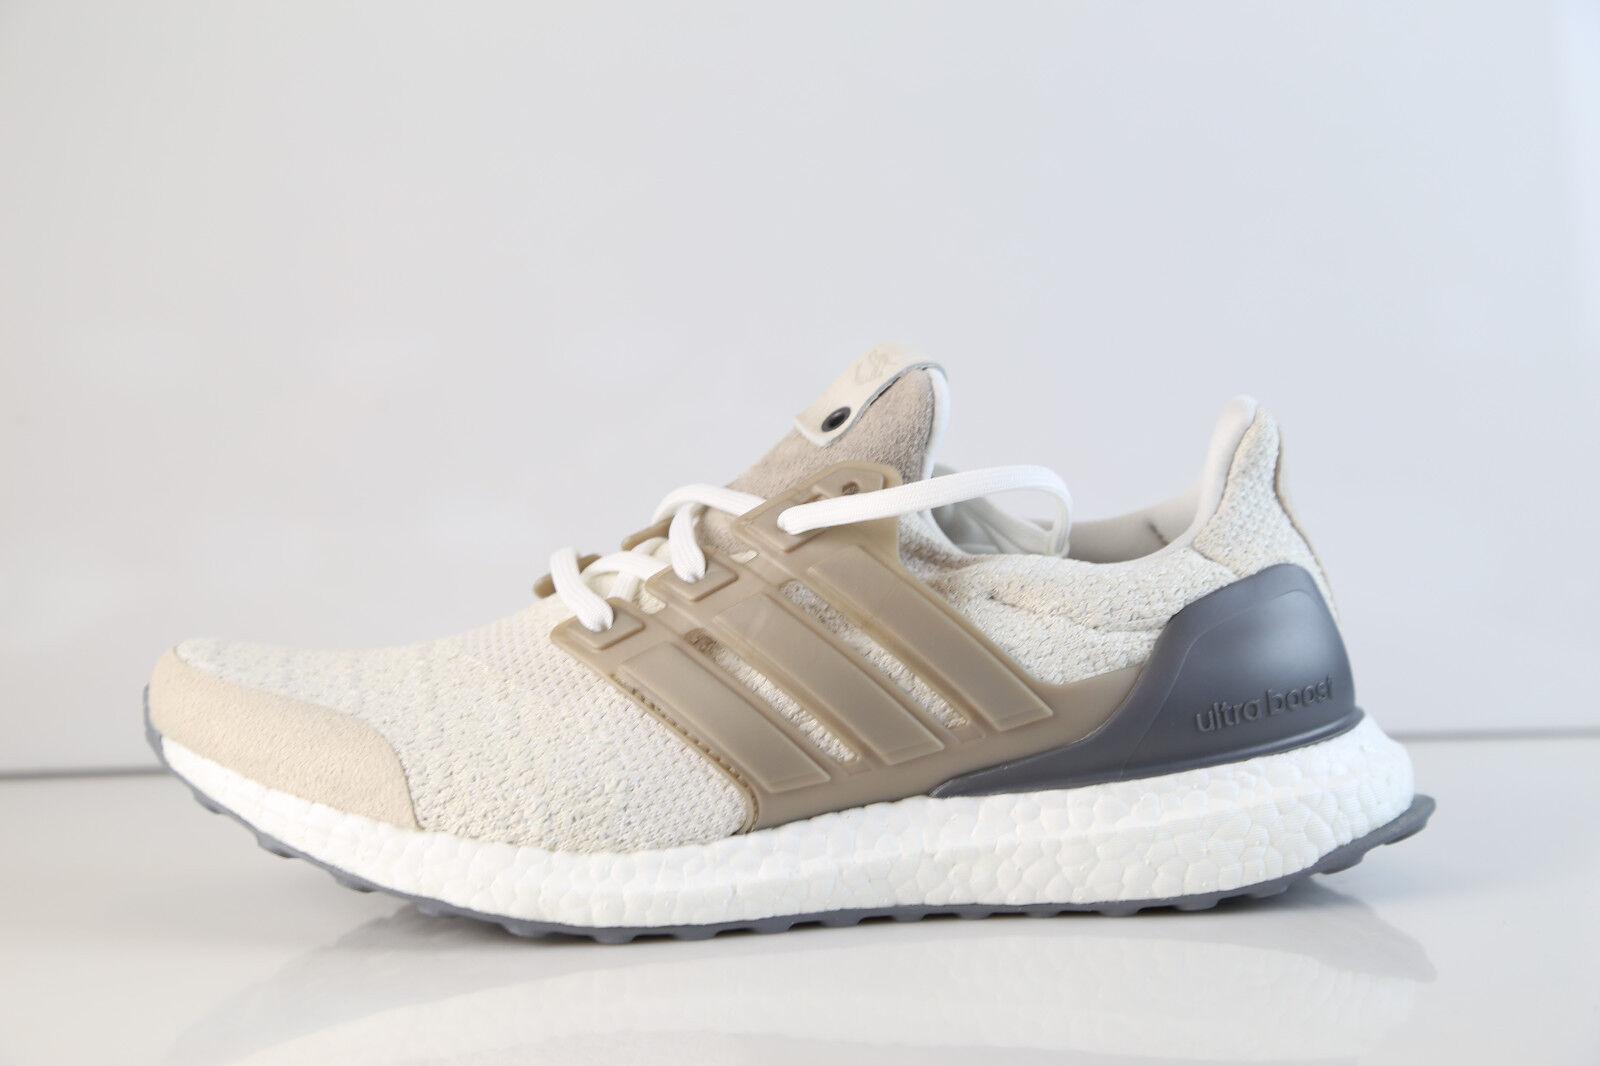 Adidas consorzio ultraboost lux db0338 7.5-10.5 ultra impulso tan